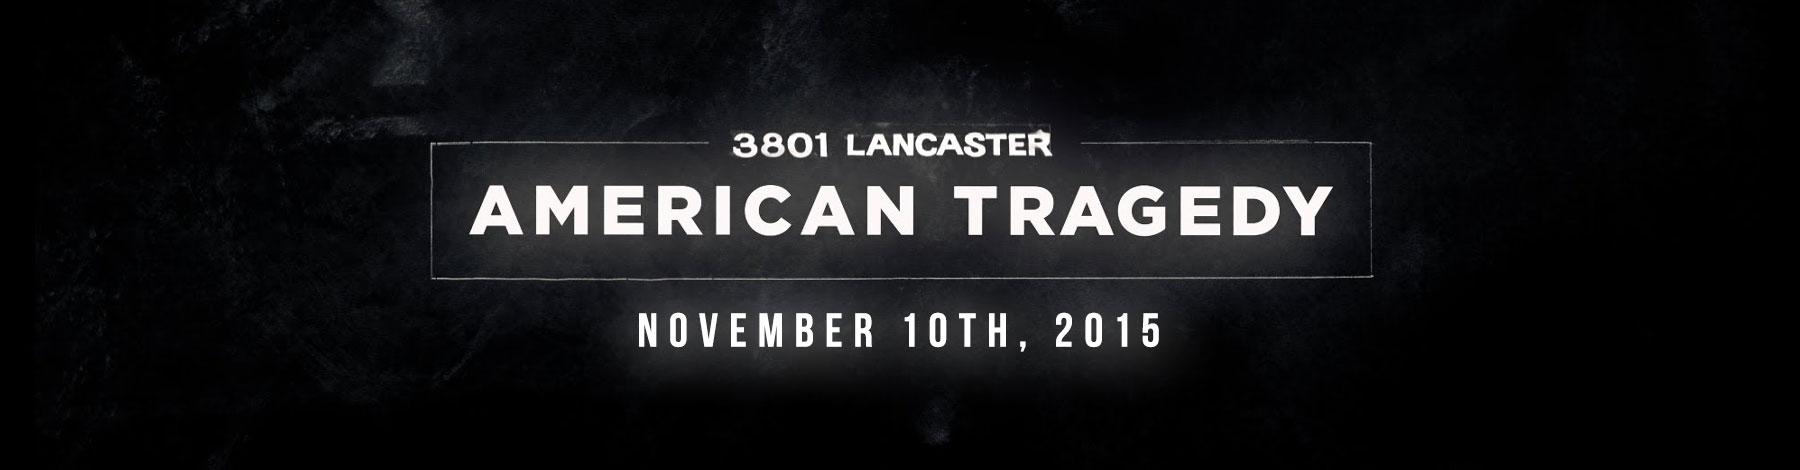 3801-Lancaster-An-American-Tragedy-Rotator-9-22-15